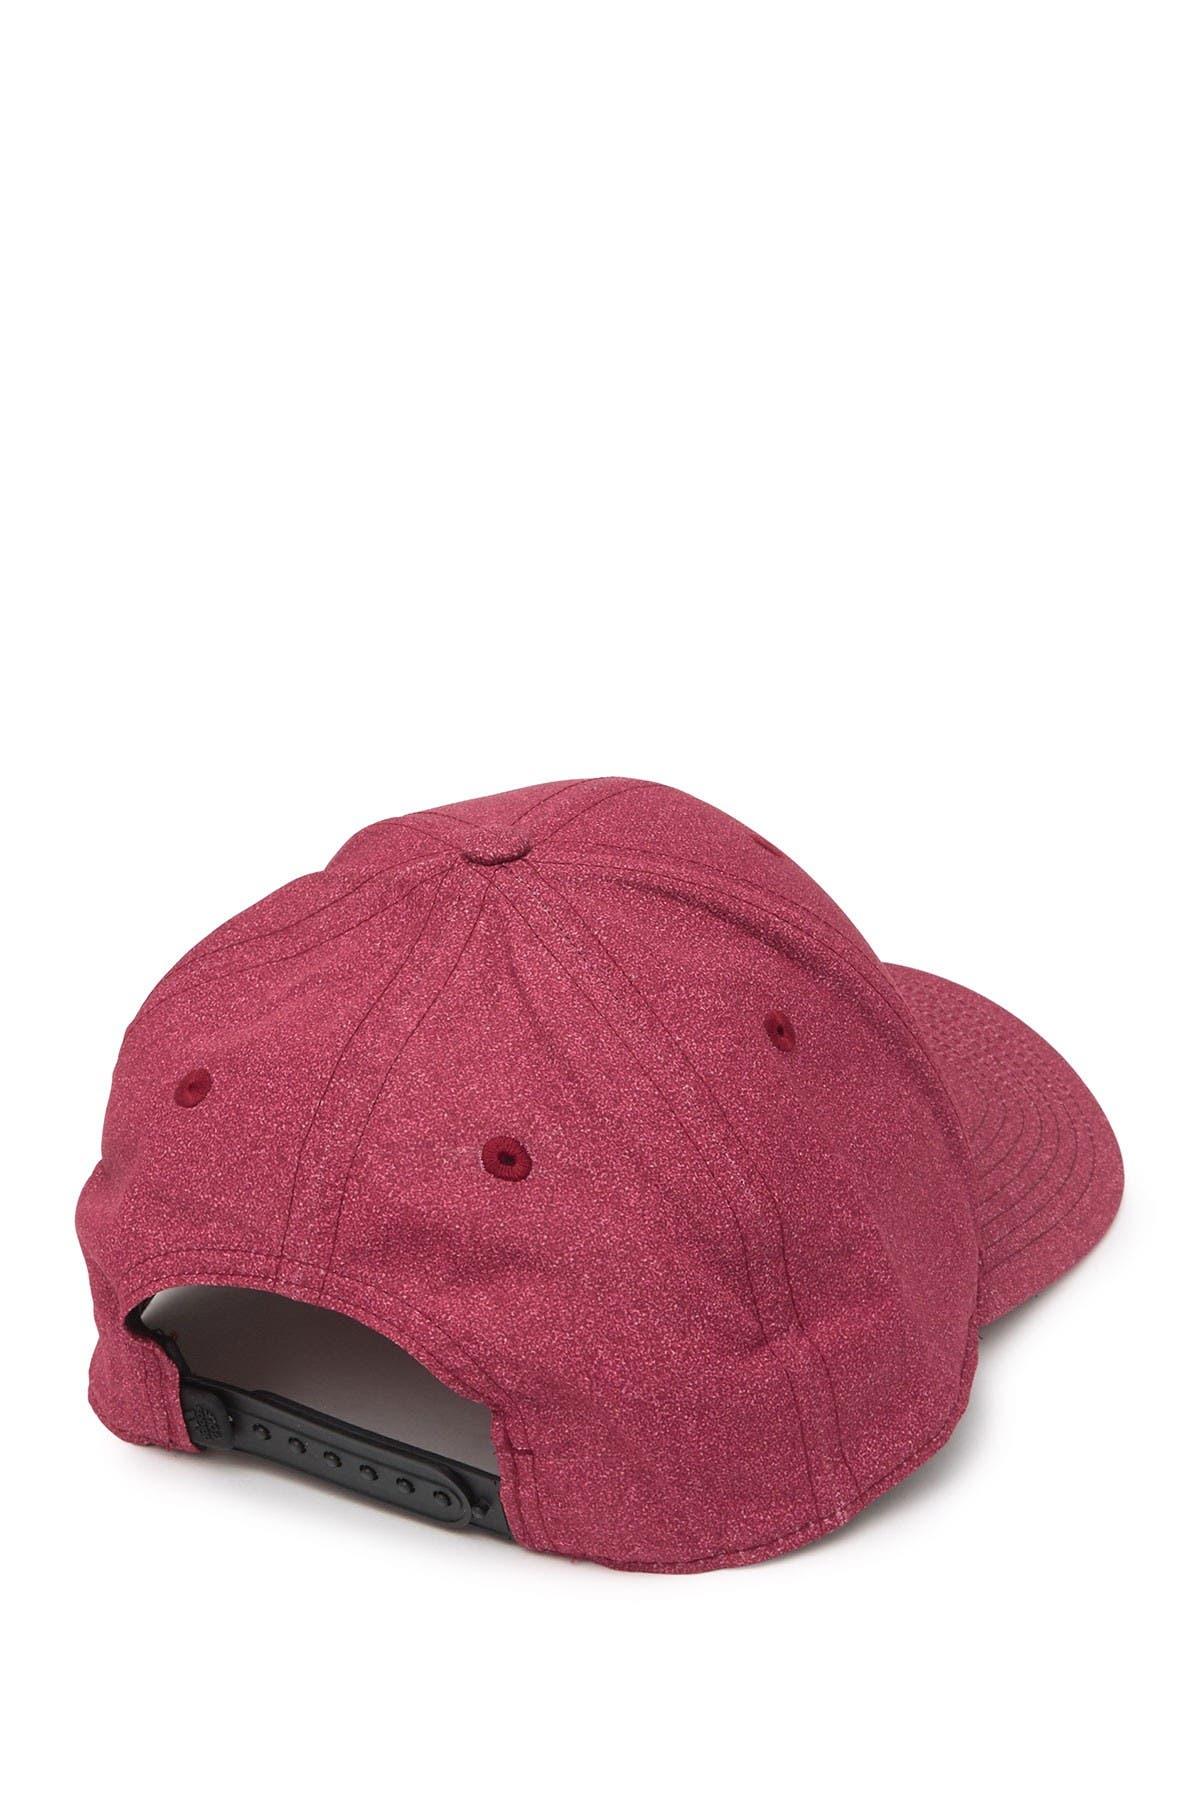 Image of Adidas Golf Golf Digital Print Hat